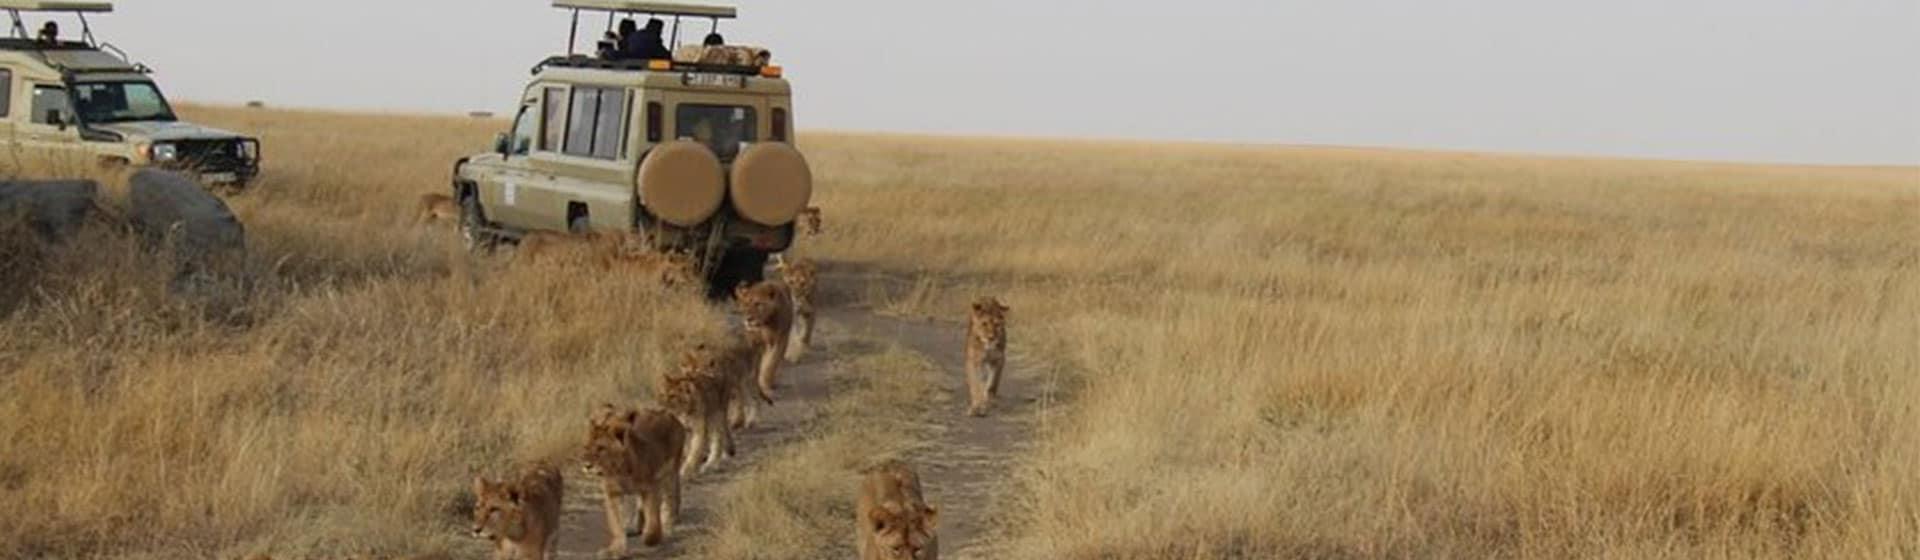 game viewing in Serengeti